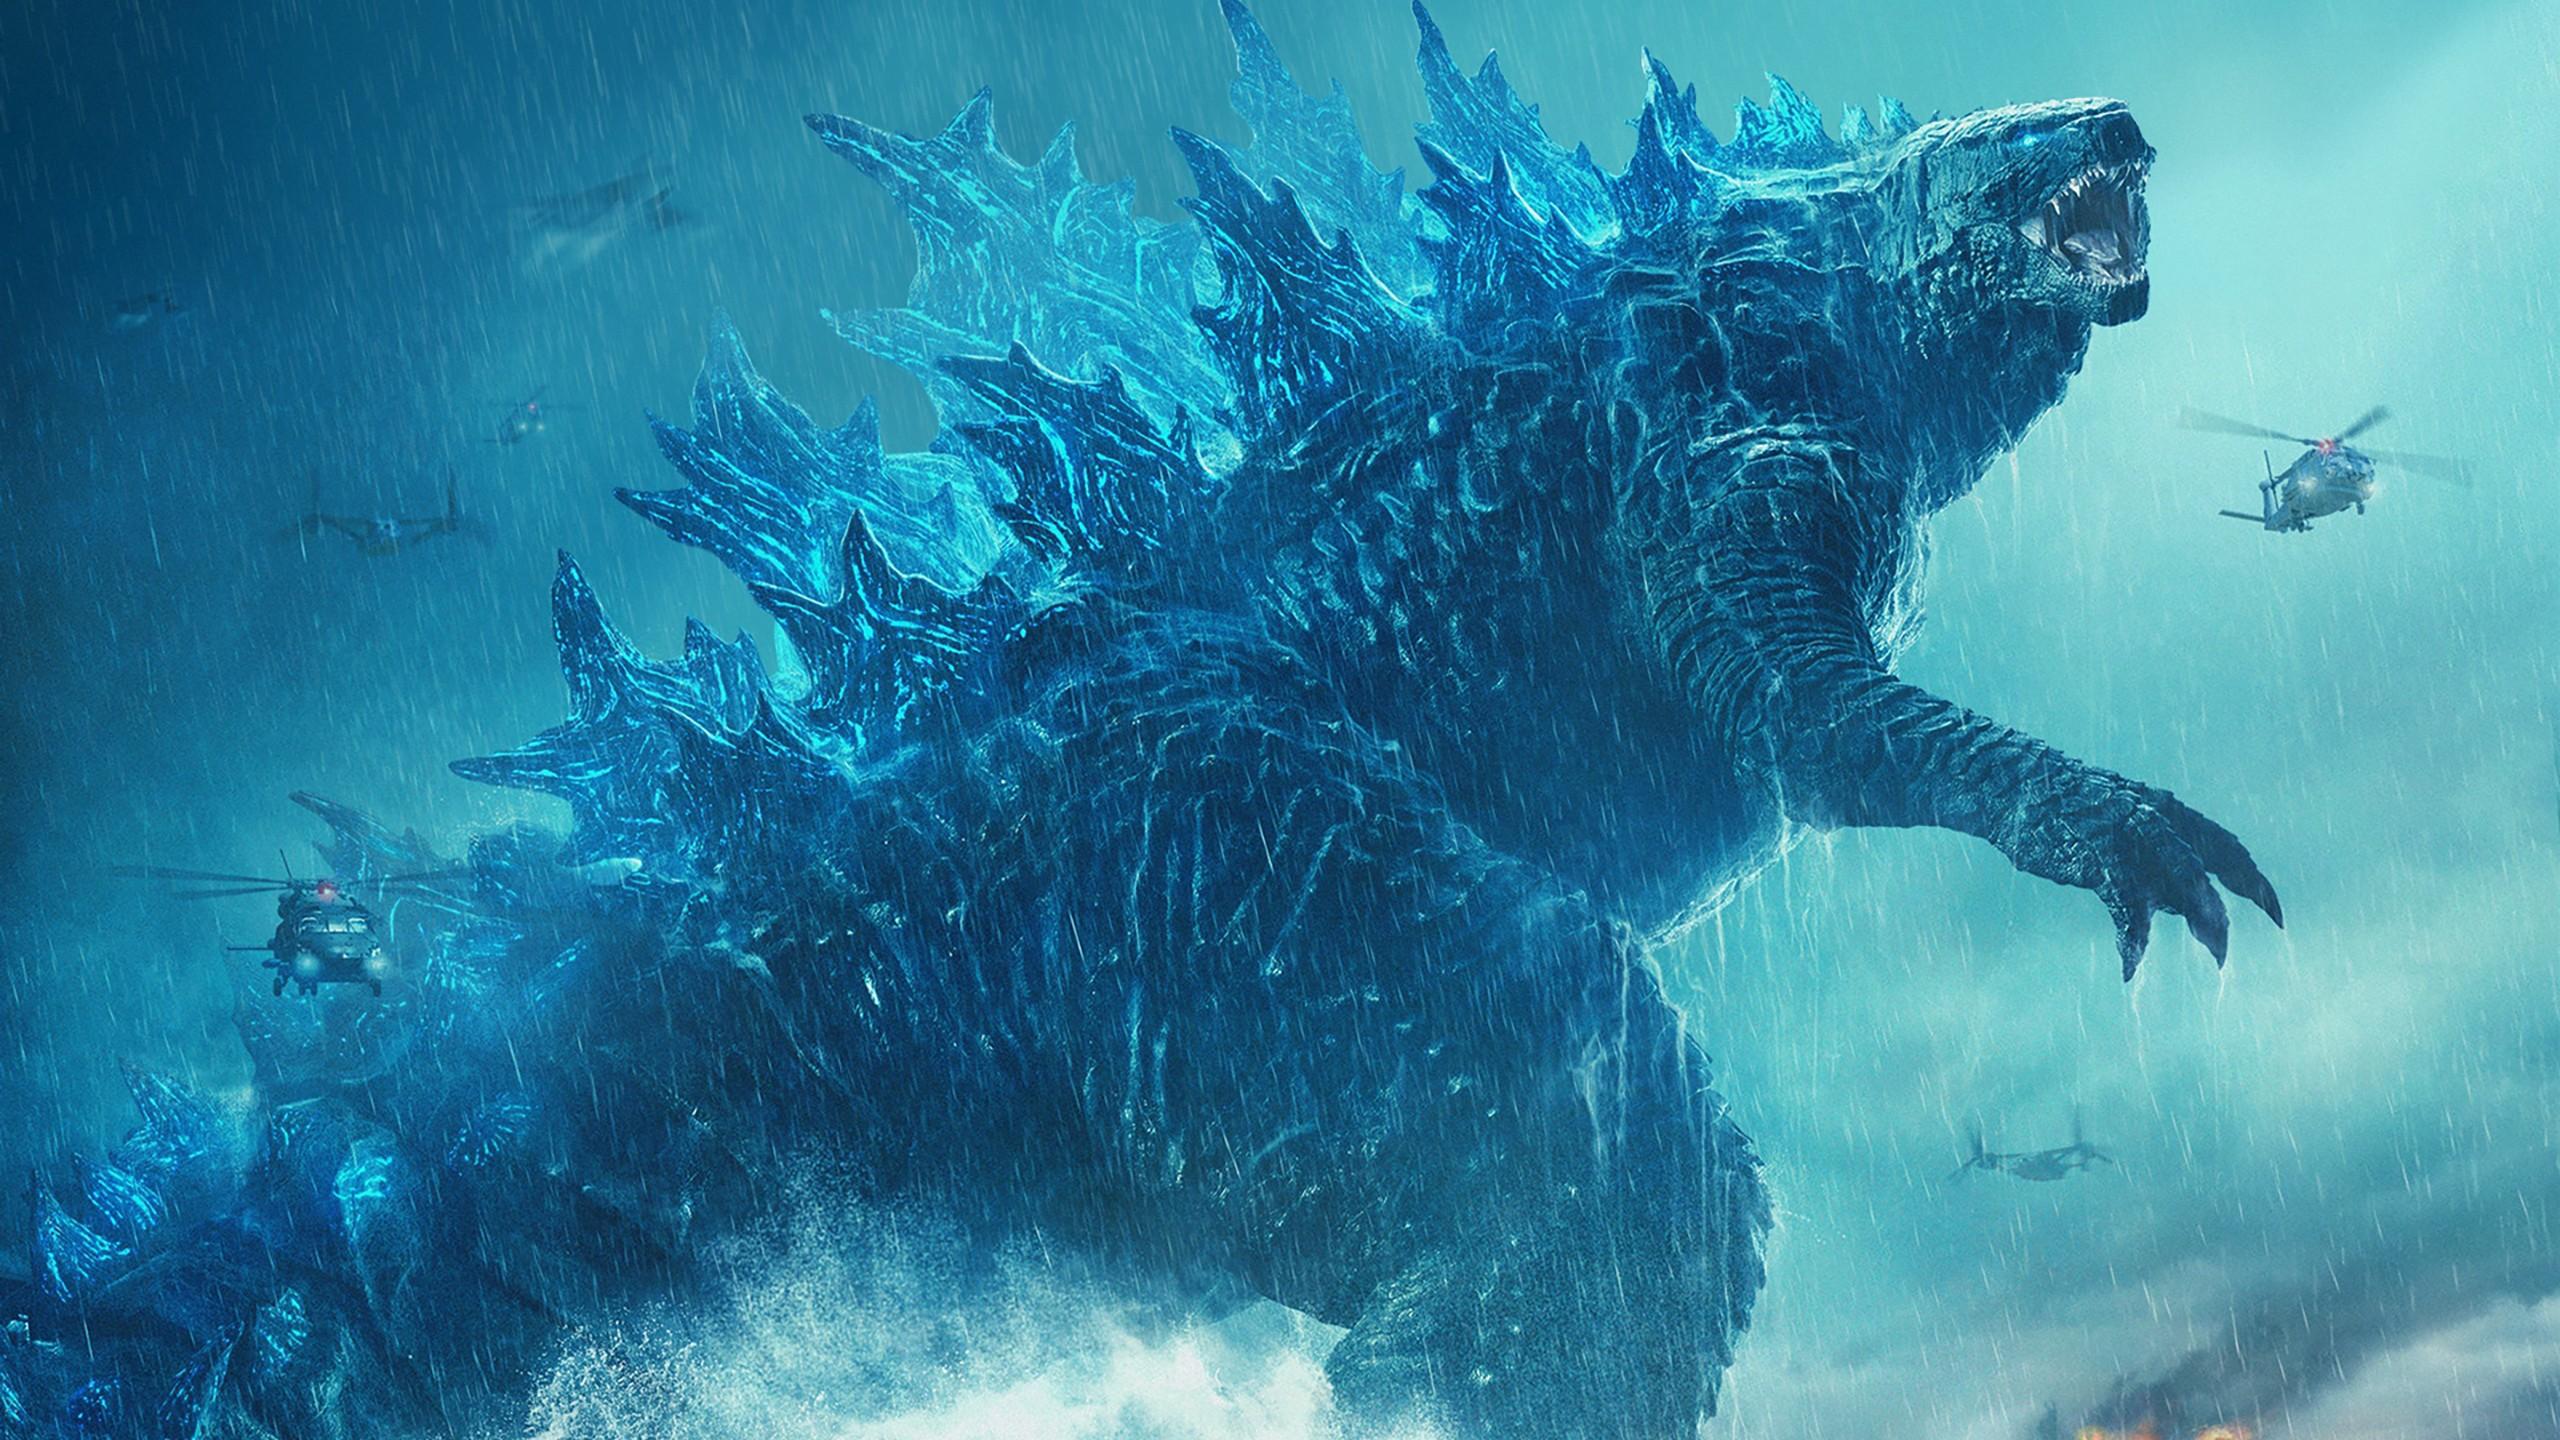 Godzilla Vs King Ghidorah 4k Wallpapers Hd Wallpapers